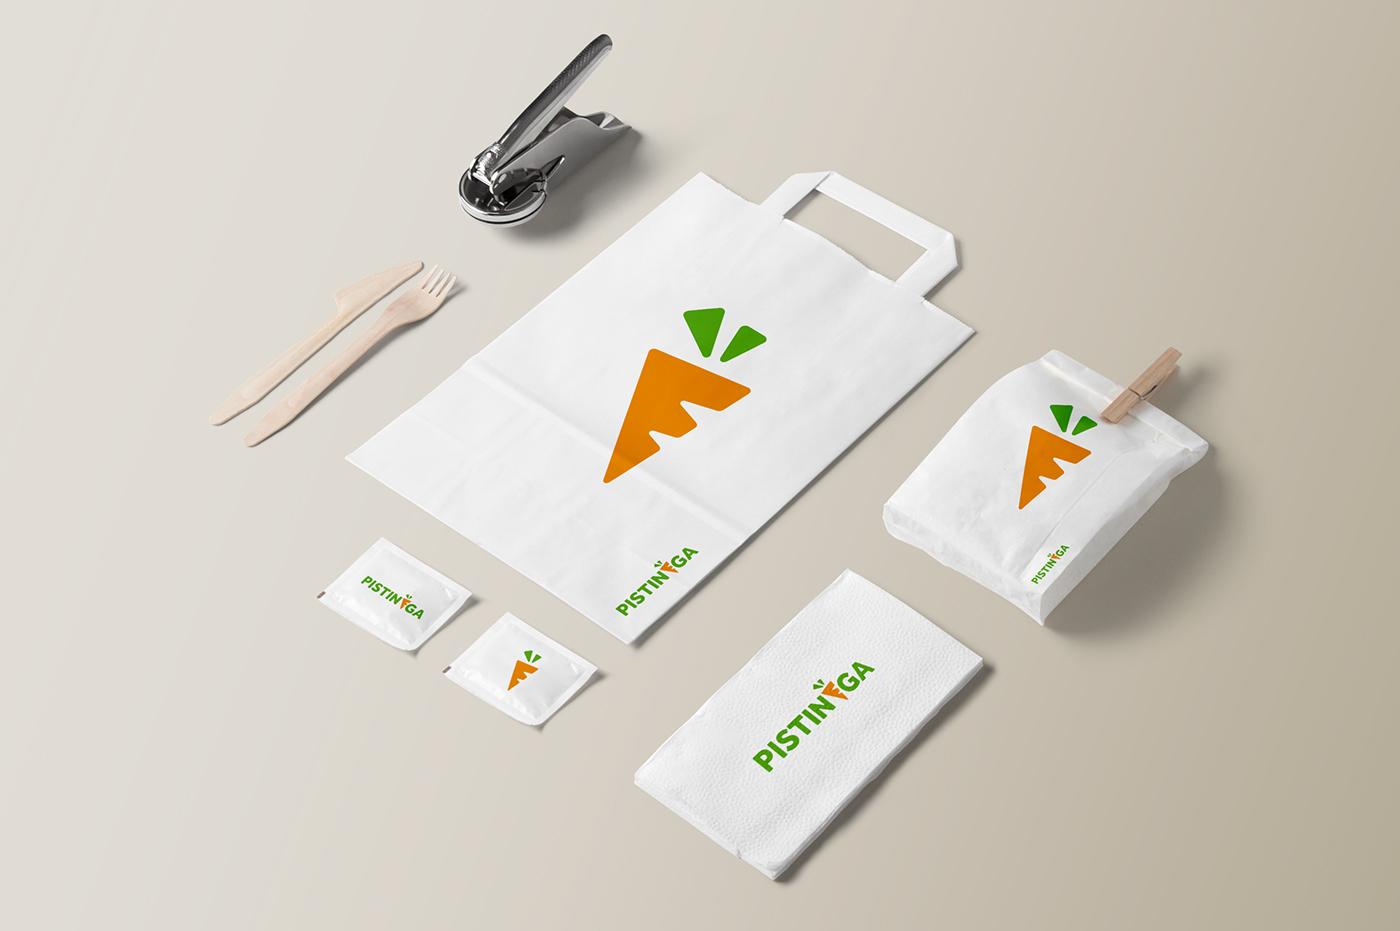 juicebar fruitbar bar carrot logo brand design Stationery bologna brand identity corporate Logotype